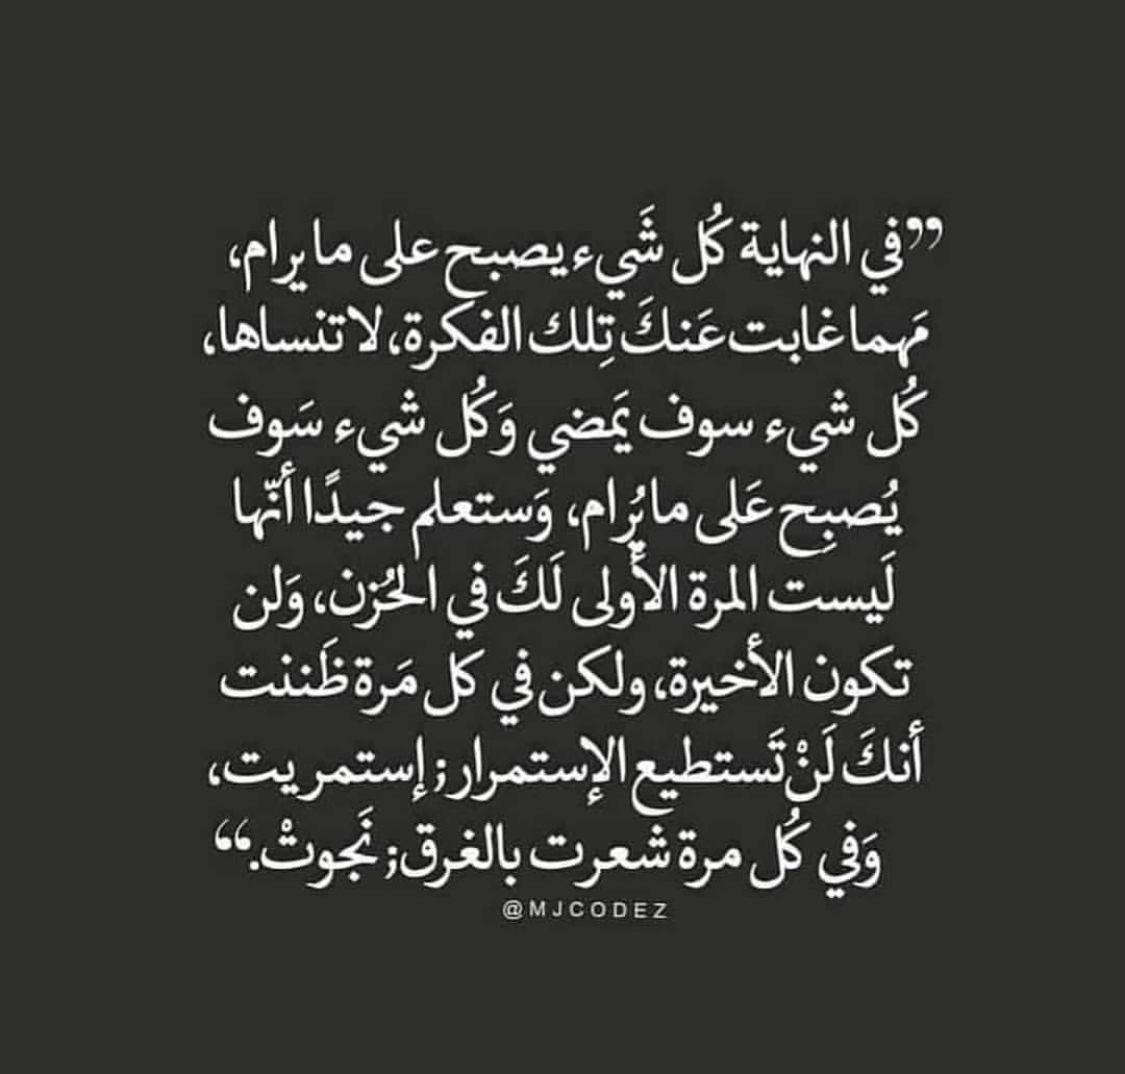 اقتباسات Calligraphy Arabic Calligraphy Arabic